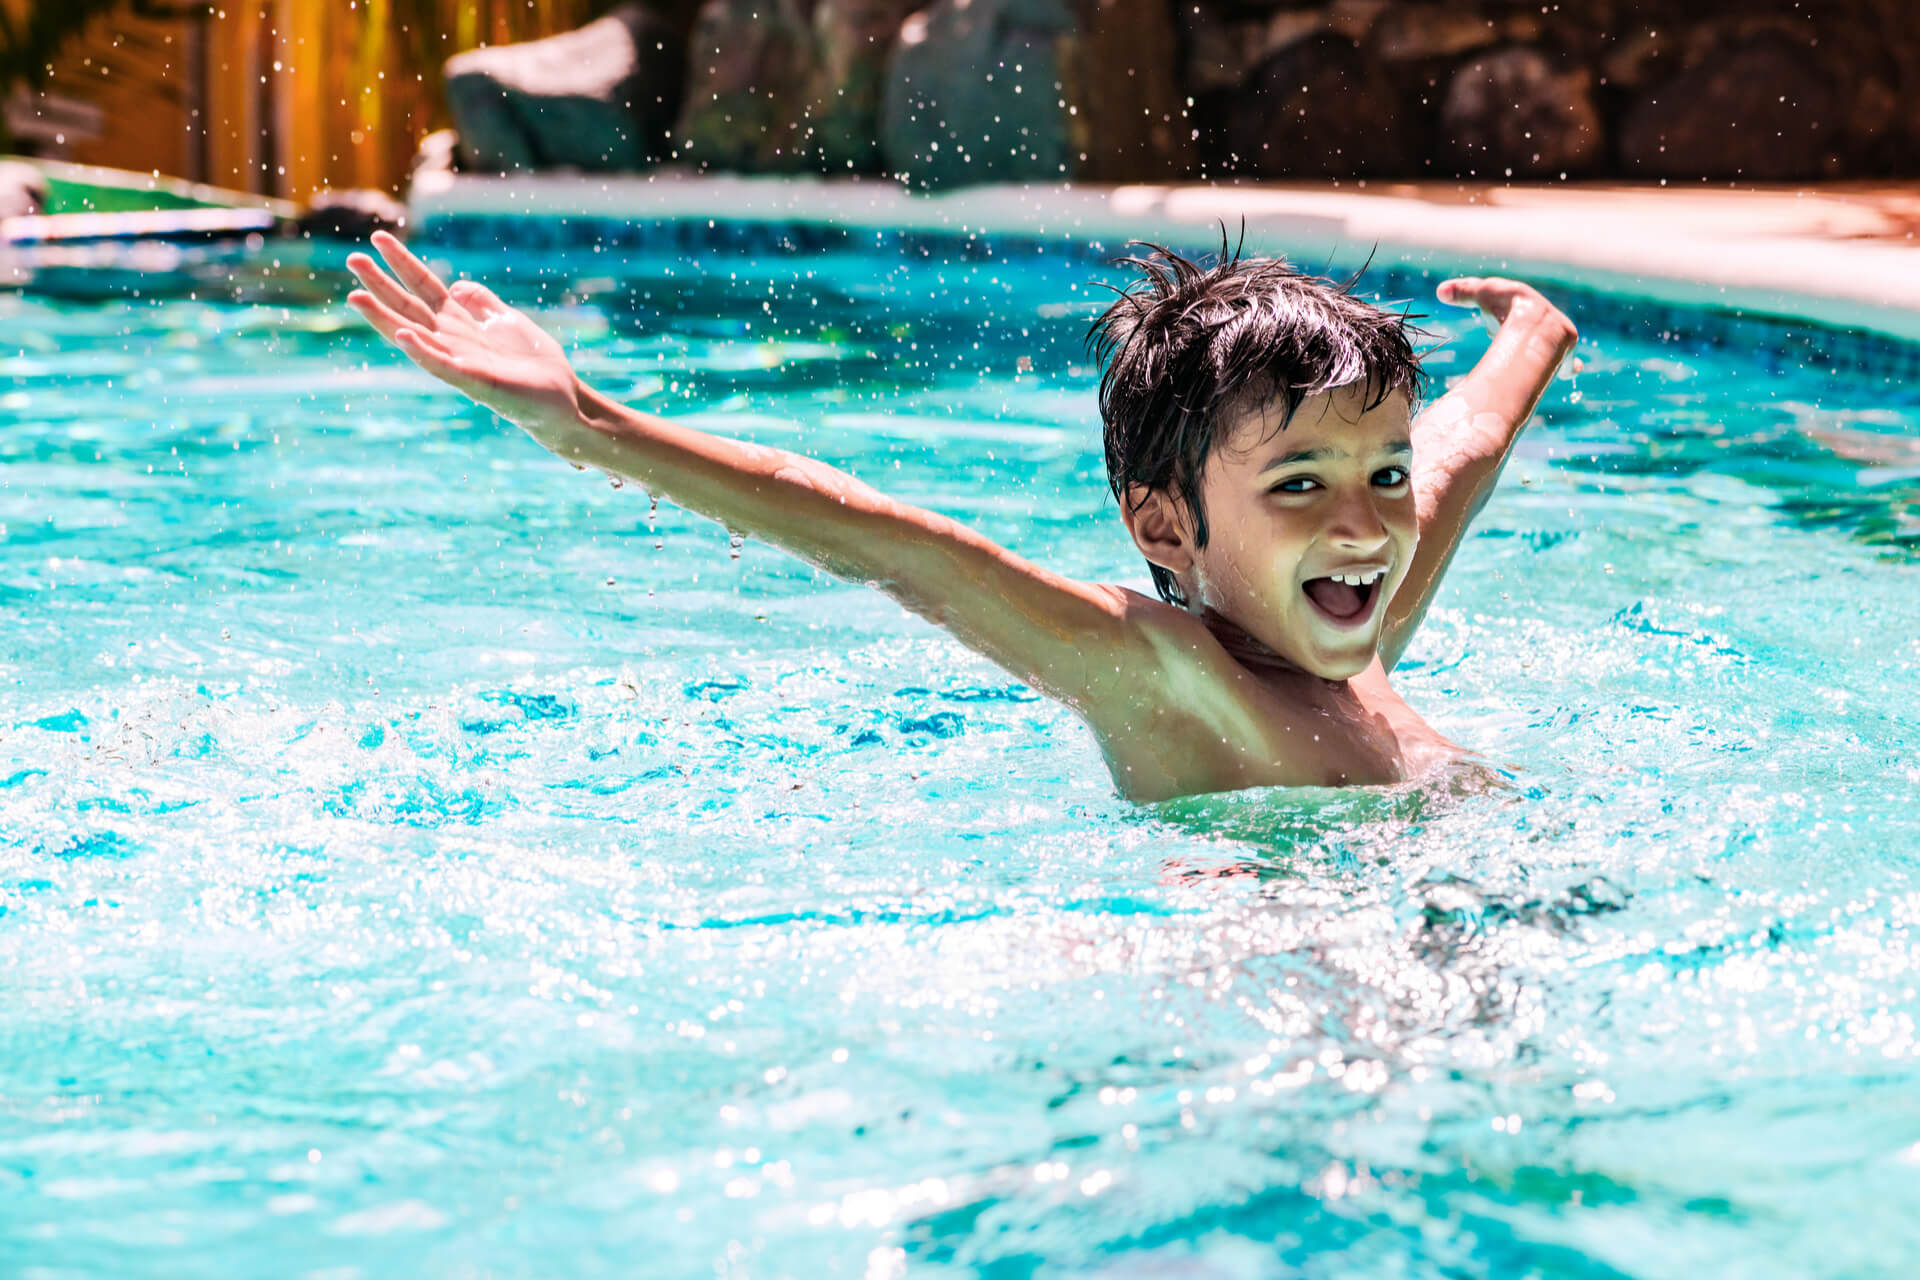 Boy Playing In Remodeled Fiberglass Swimming Pool